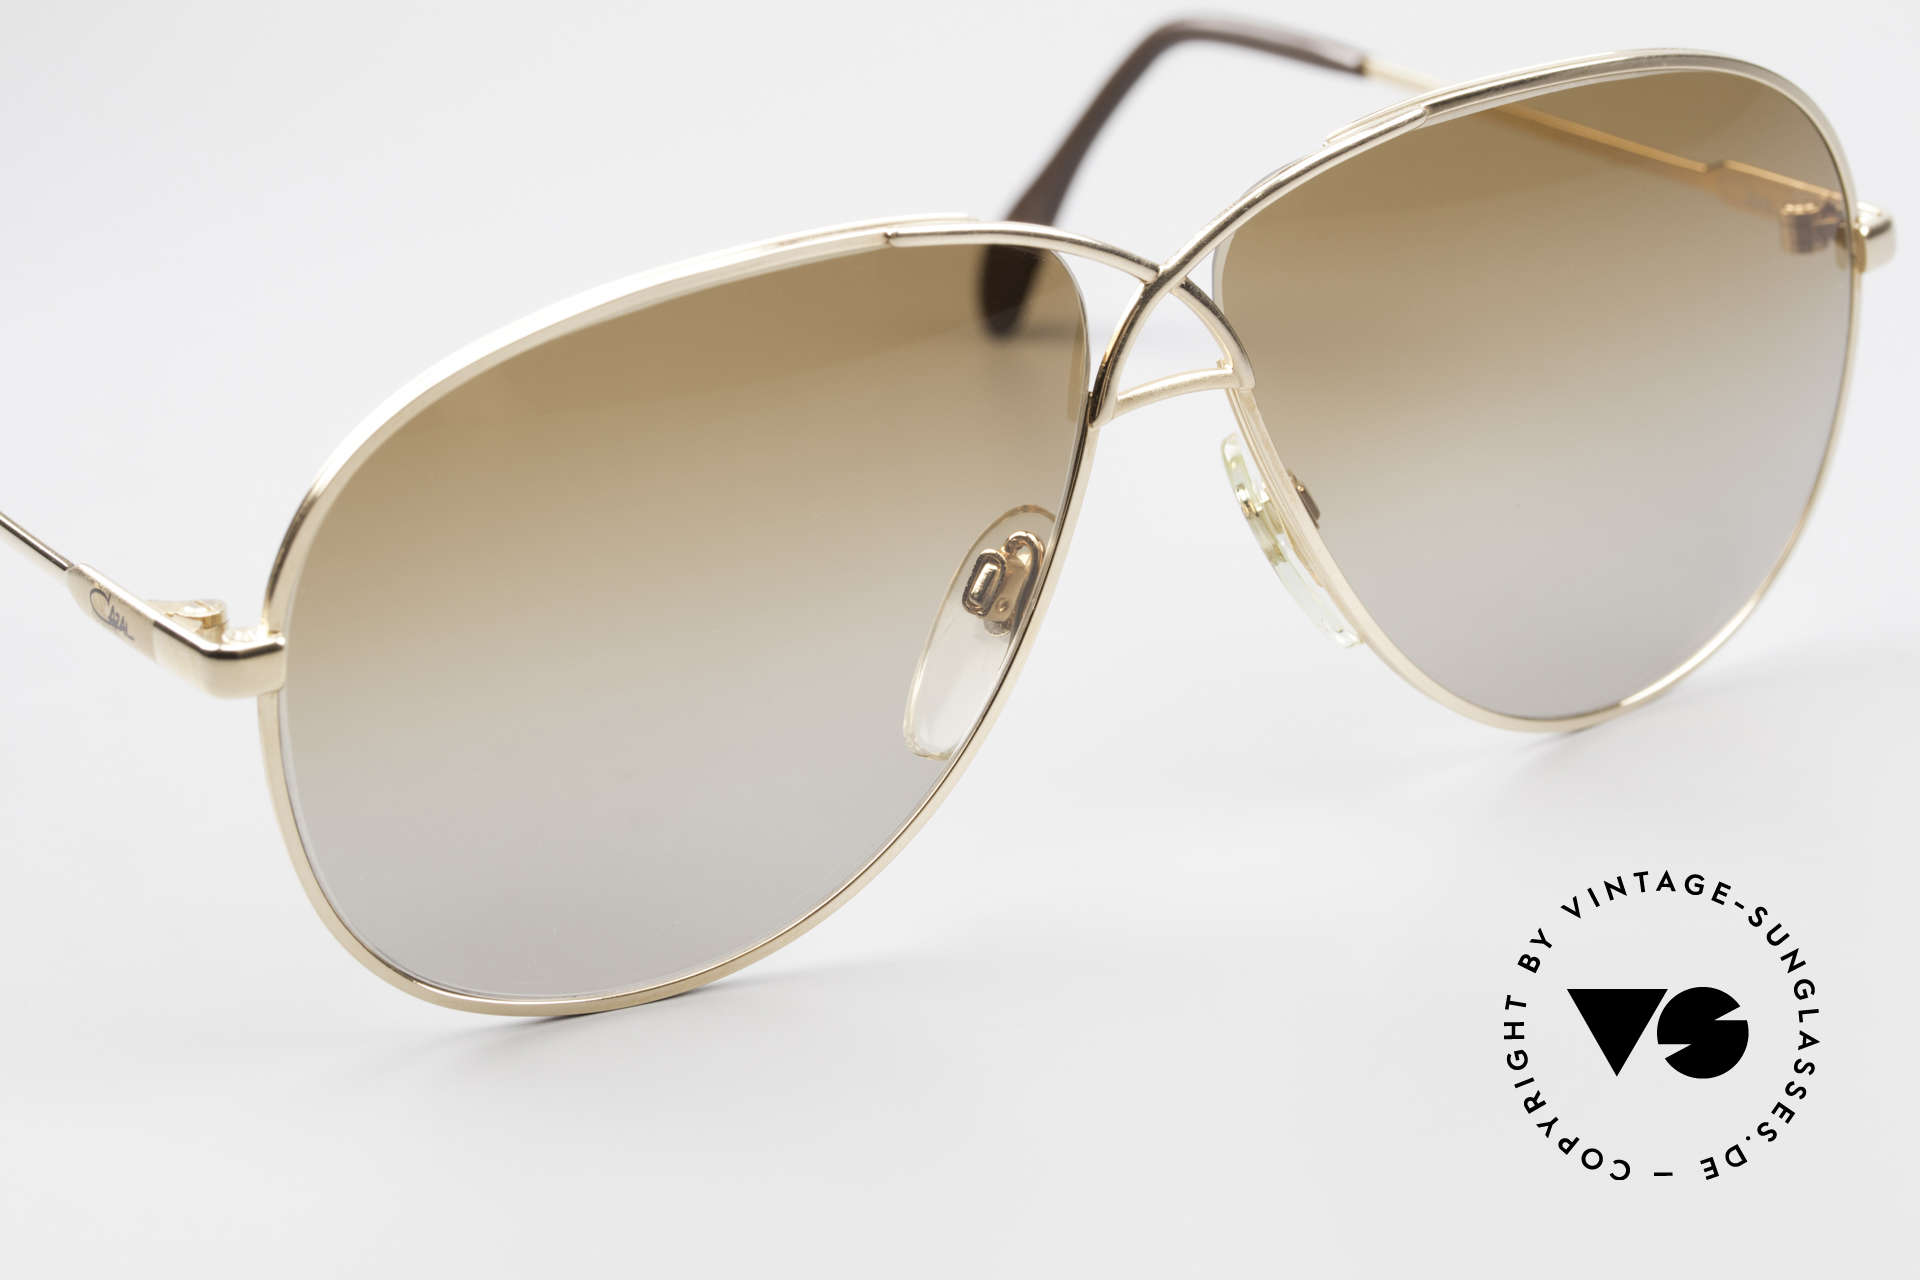 Cazal 728 Vintage Aviator Sunglasses, unworn condition 'NOS' - true vintage 80's rarity, Made for Men